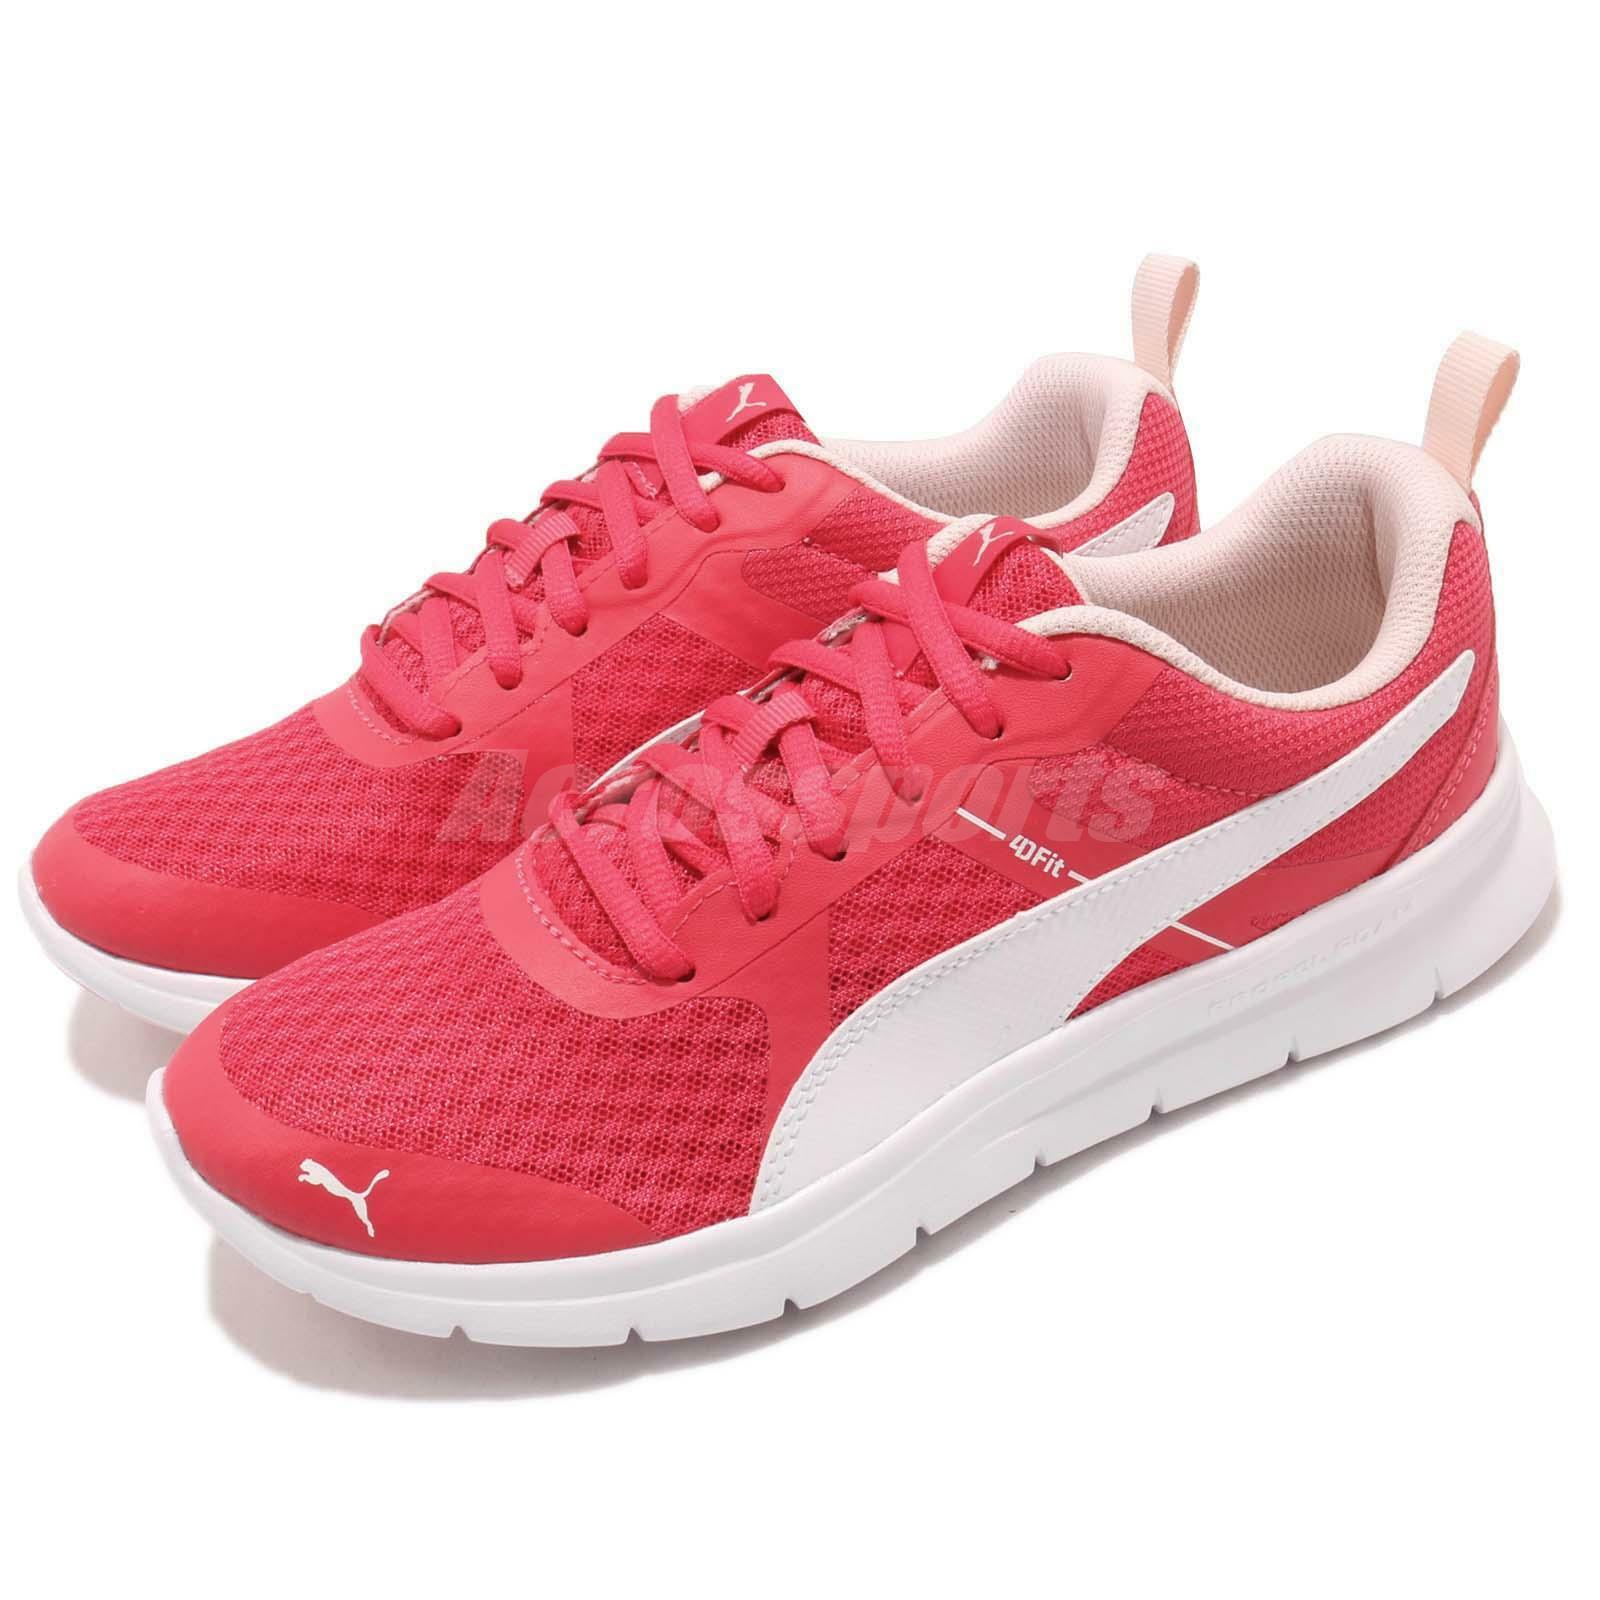 Puma Flex Essential rosa bianca Uomo Donna In esecuzione Scarpe scarpe Scarpe esecuzione da Ginnastica 365268-06 ec2e3d